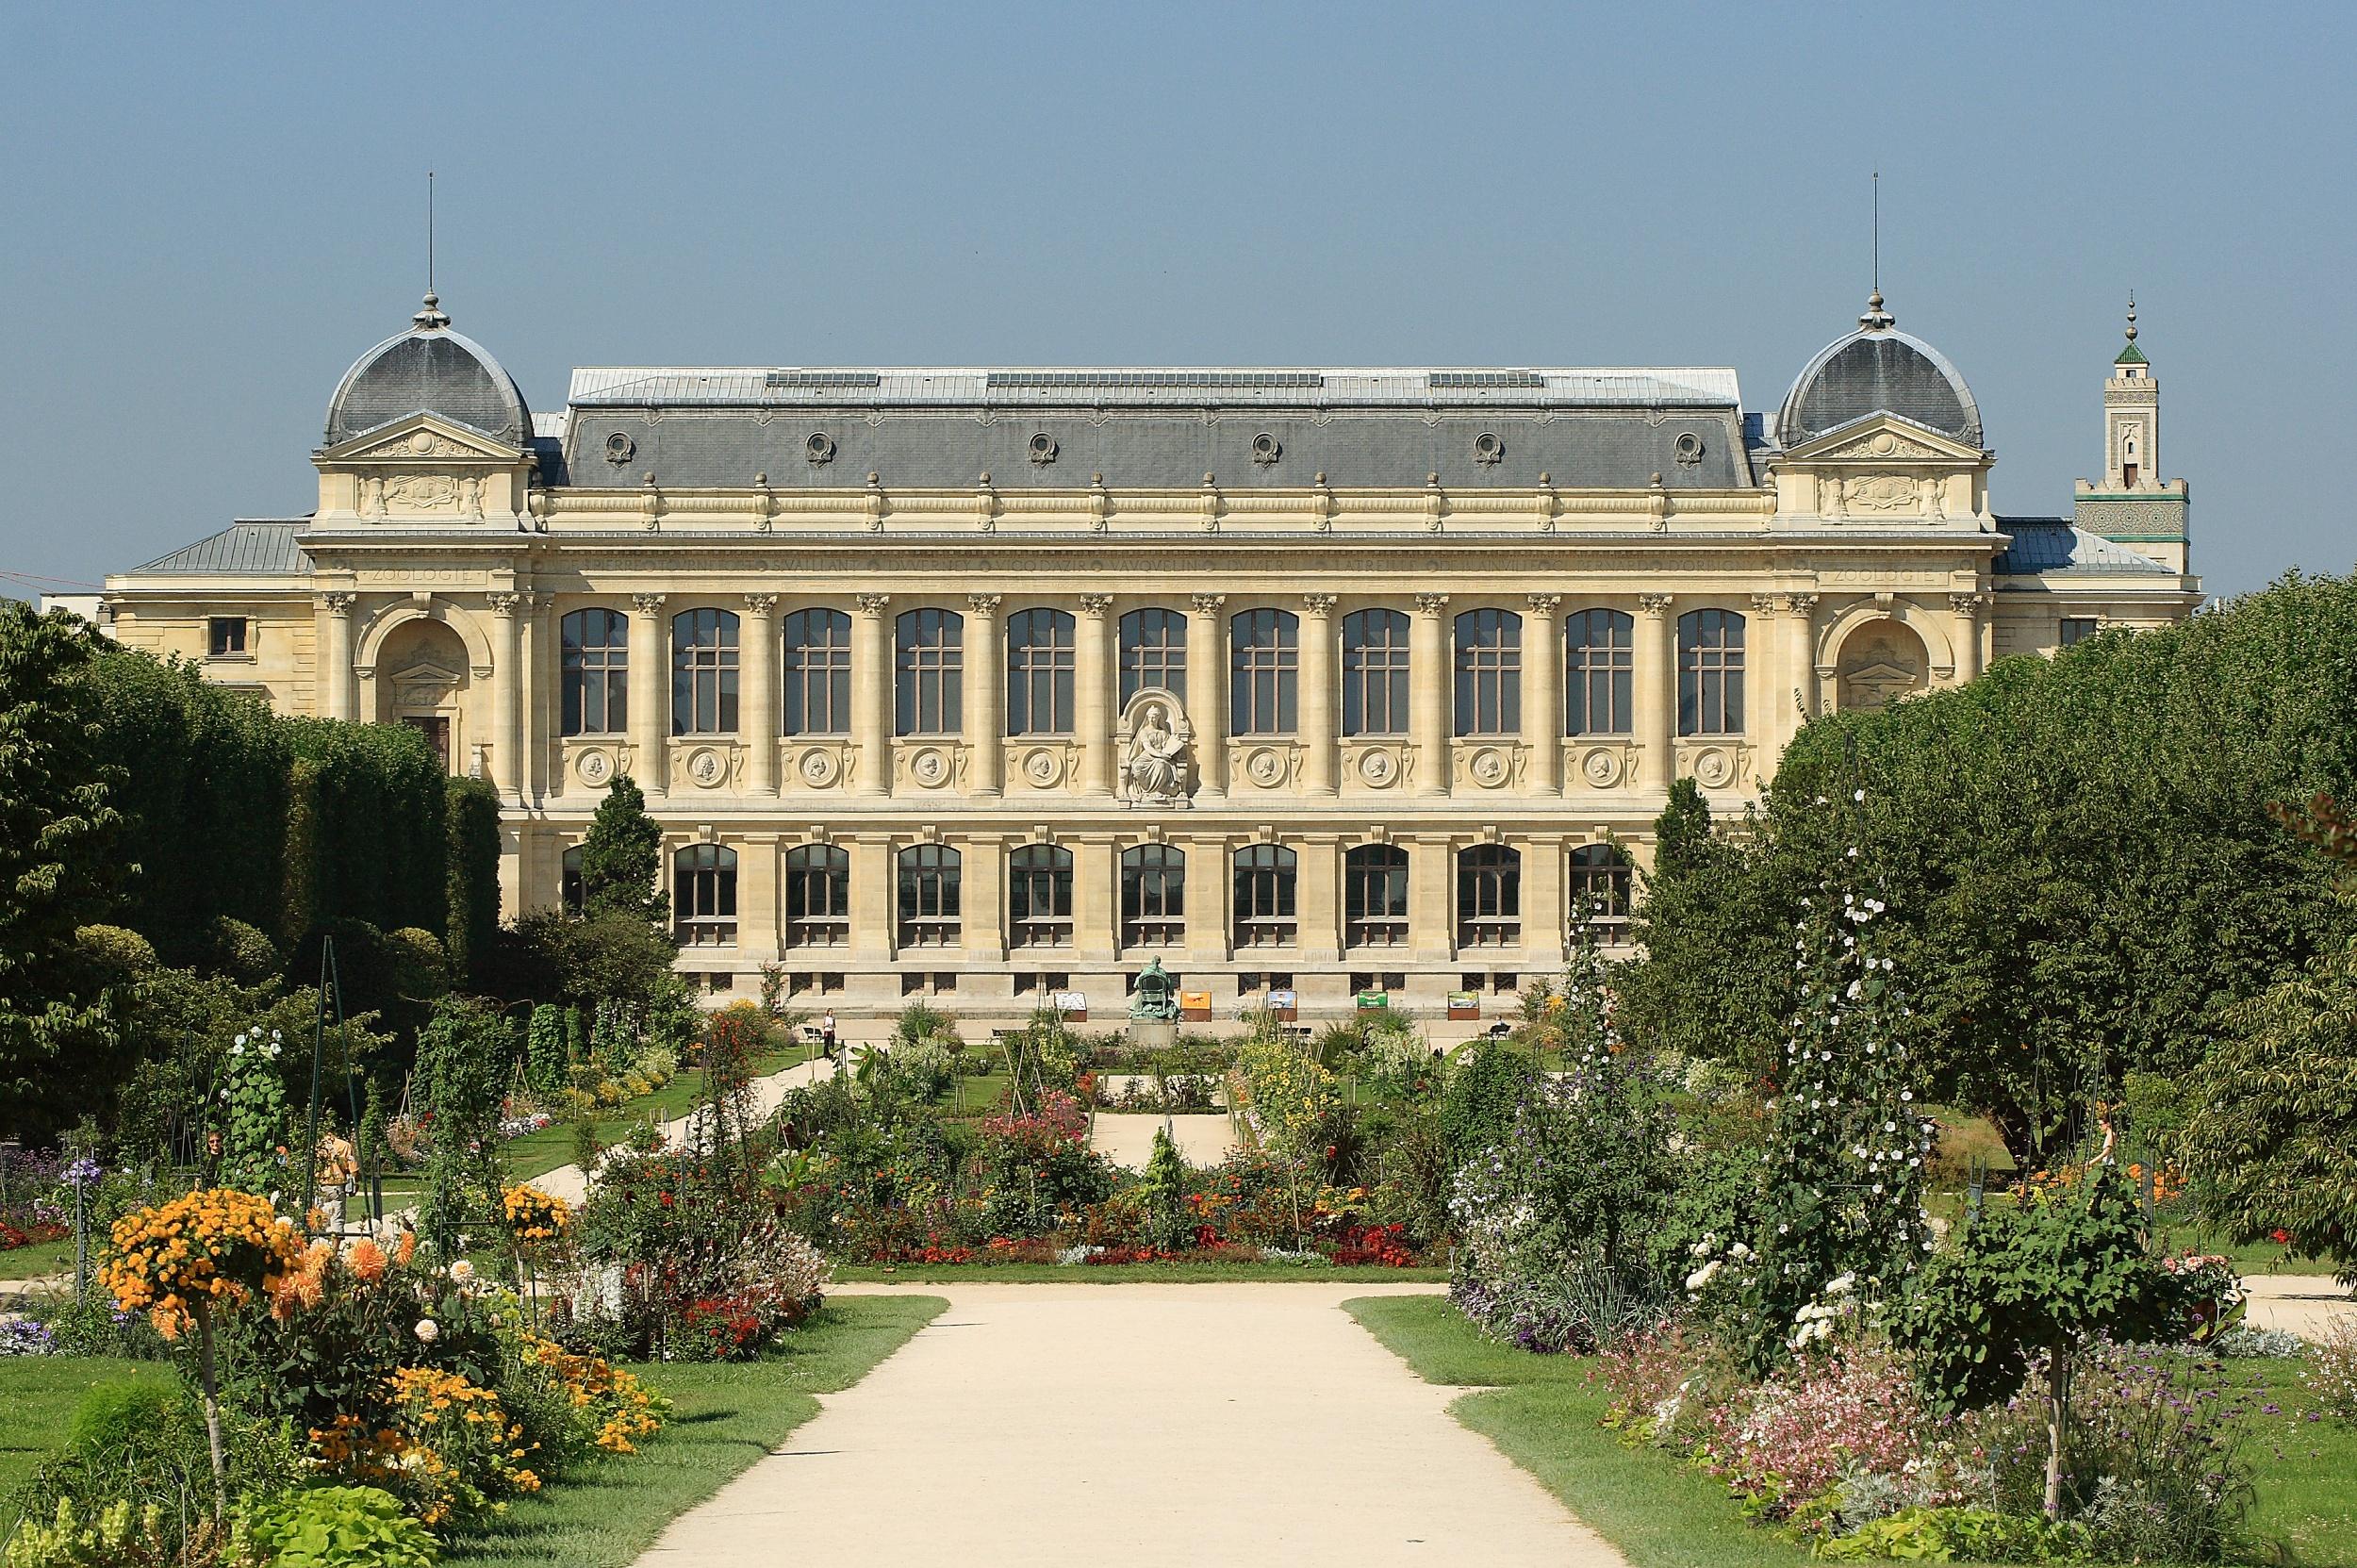 Jardin des plantes - Wikipedia